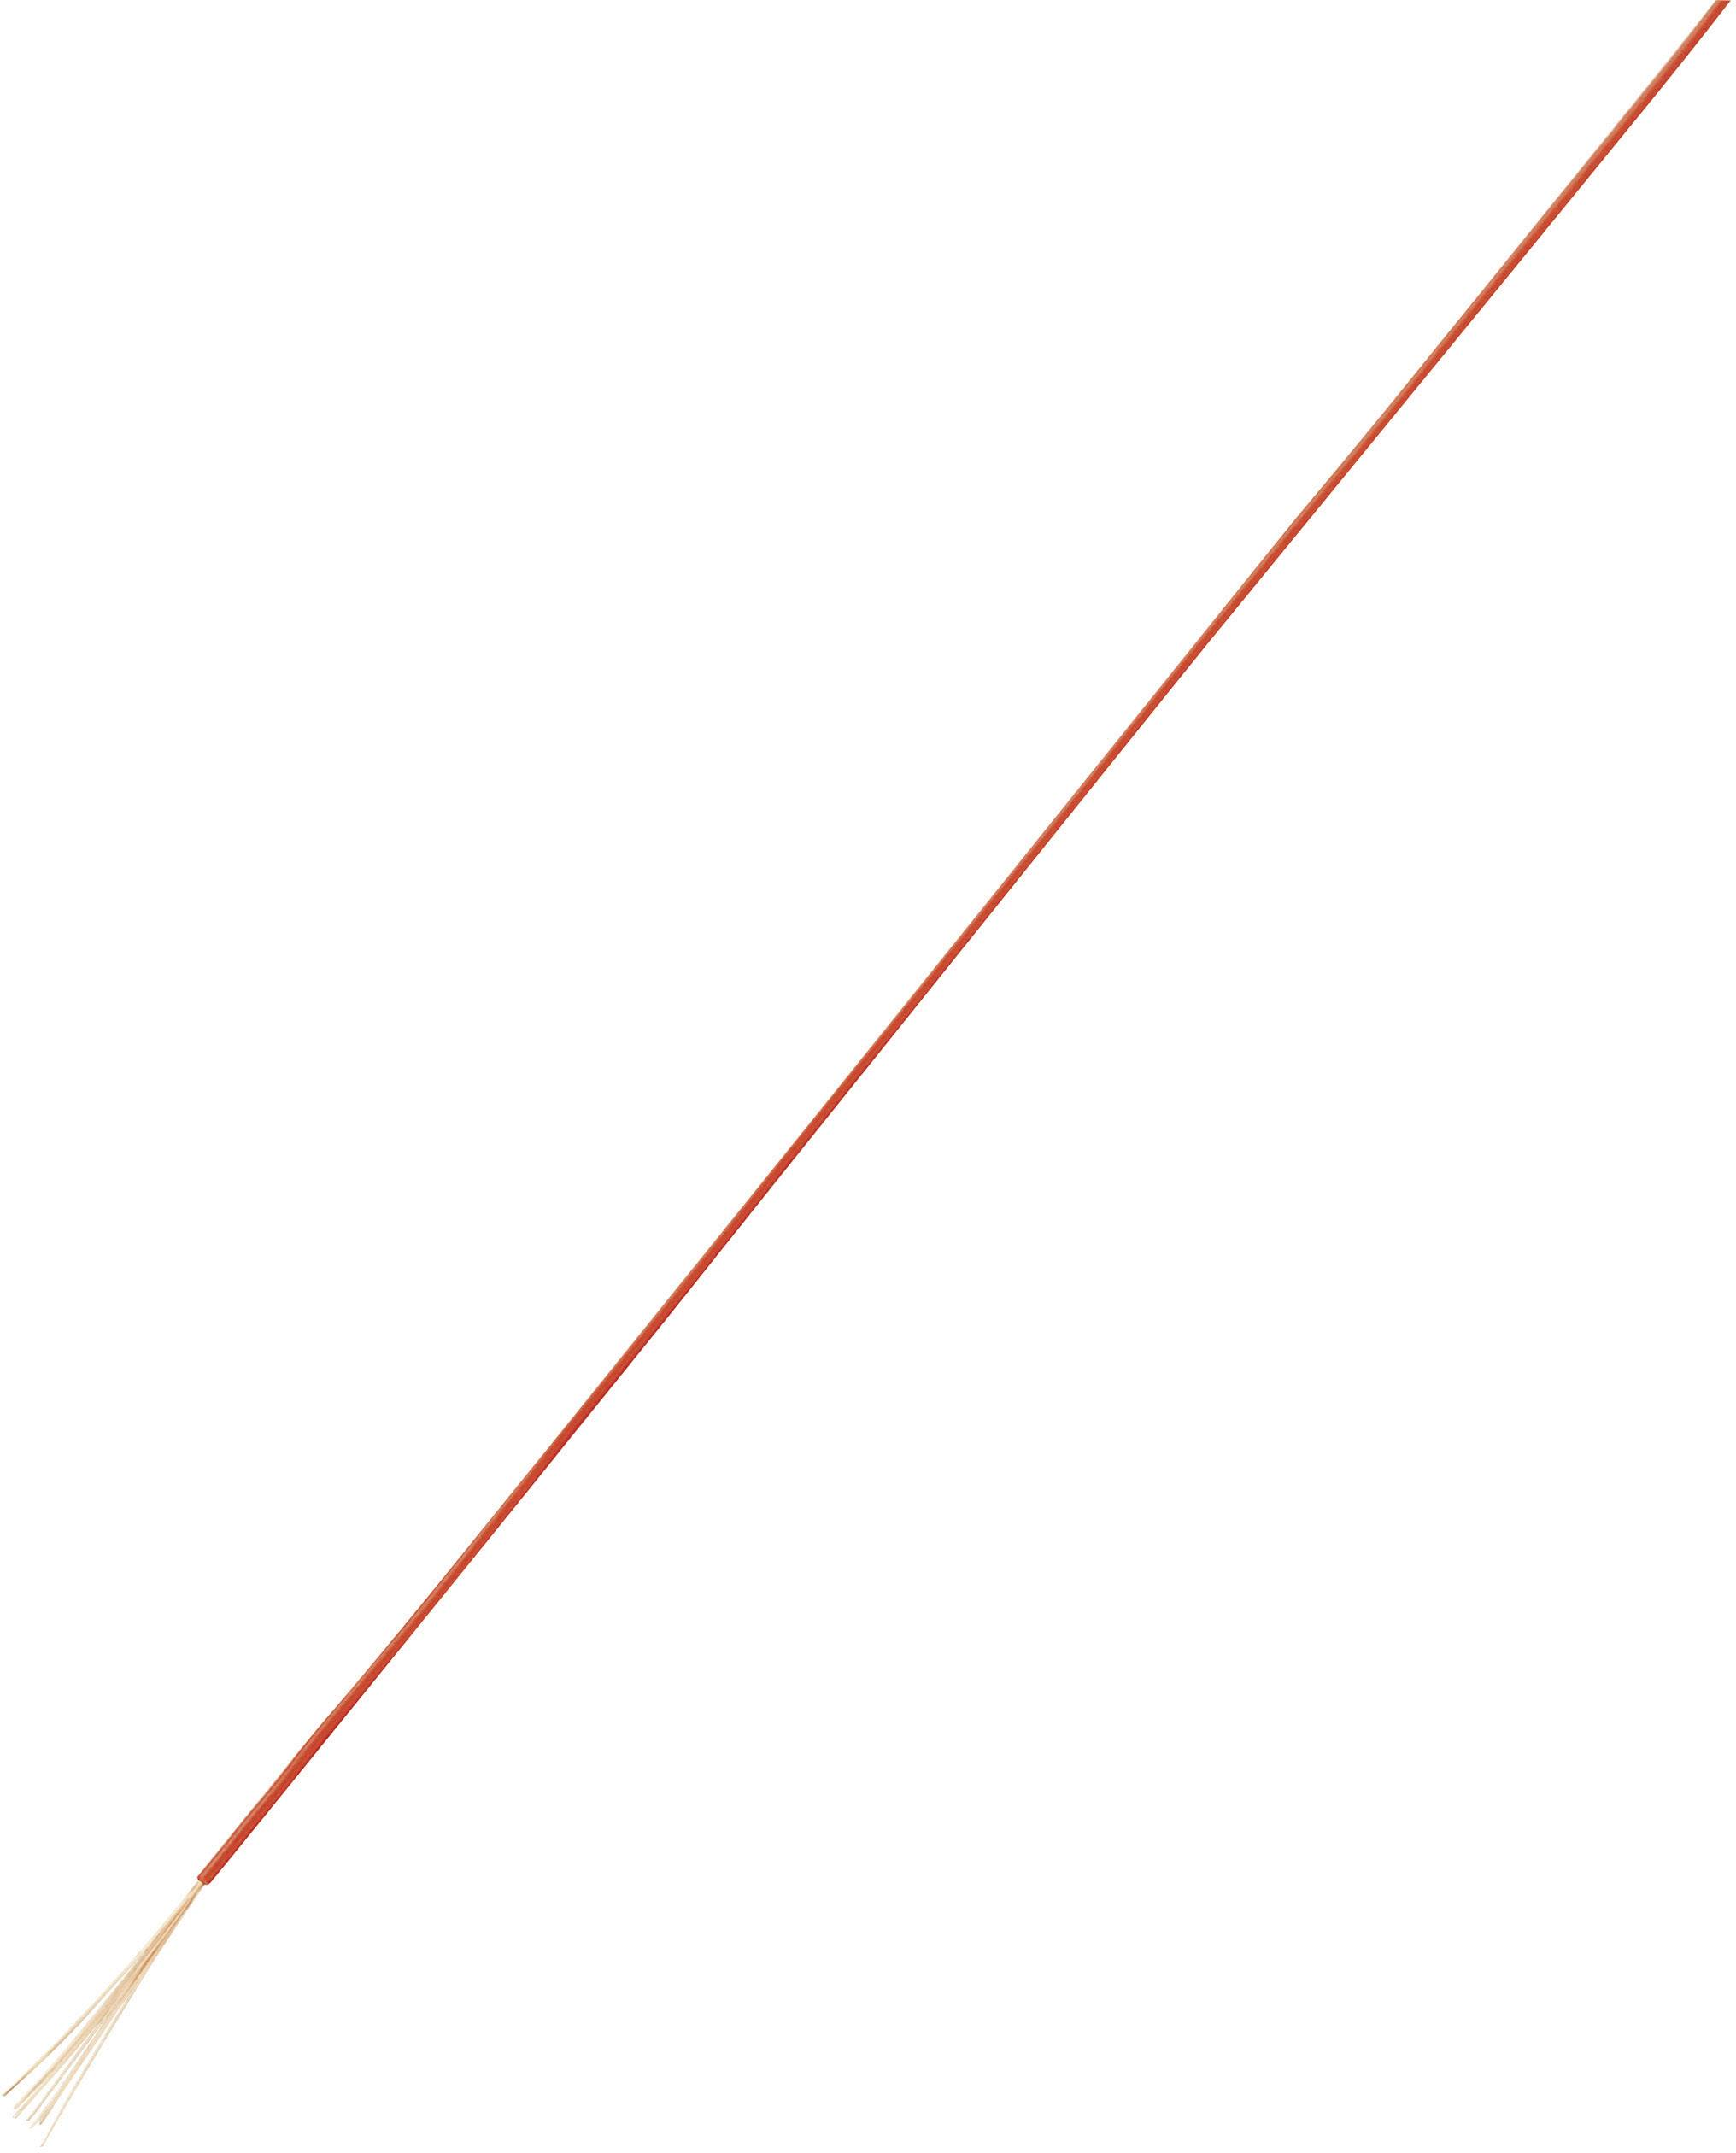 Opletenie / lanko Conrad Components 1180284 LiFY, 1 x 0.05 mm², vonkajší Ø 0.80 mm, 100 m, červená